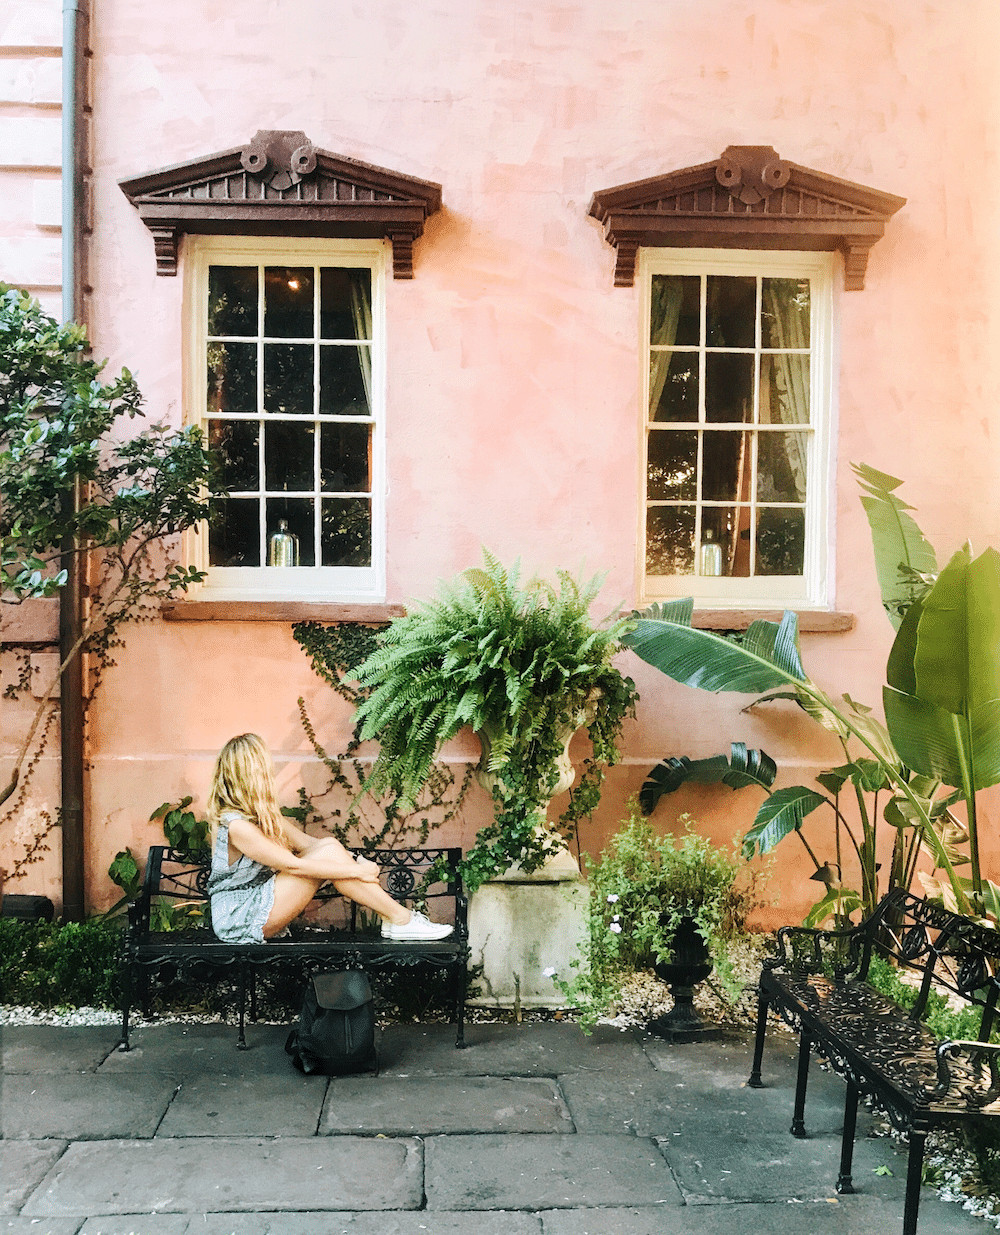 The Olde Pink House, Savannah, Georgia